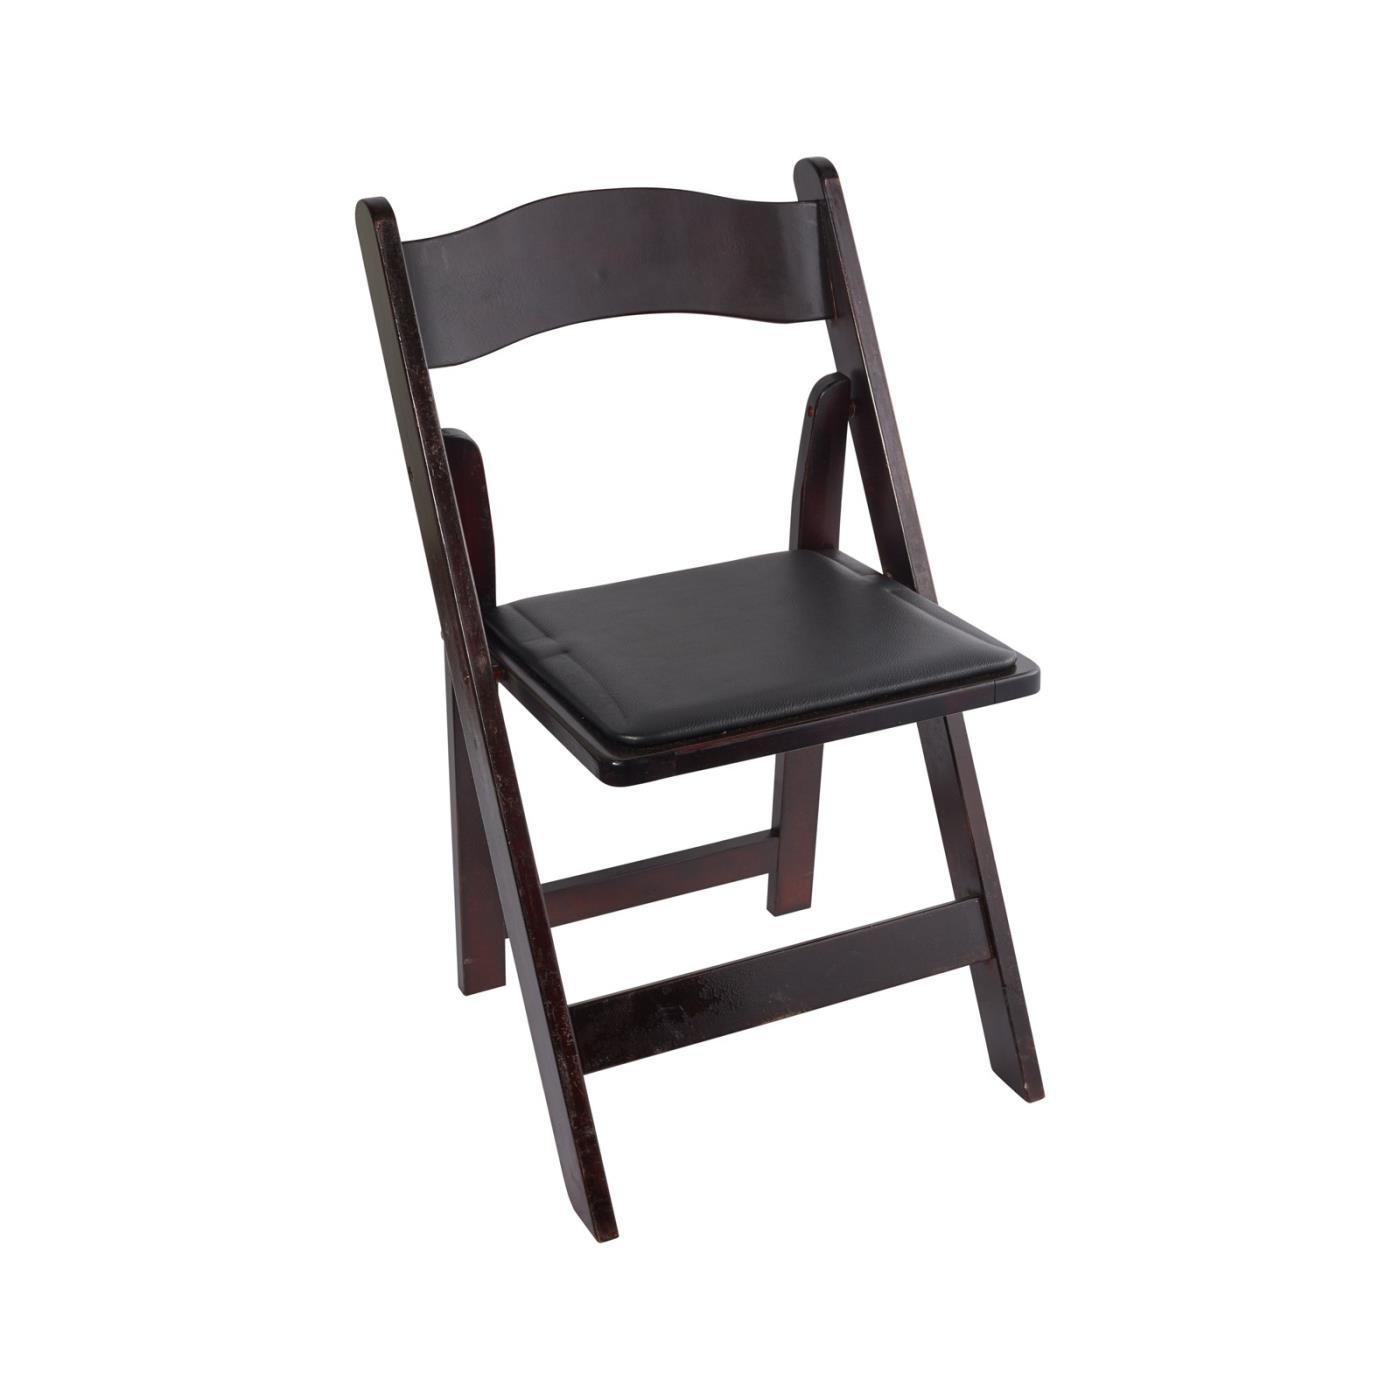 Wood Folding Chair - Mahogany Dark